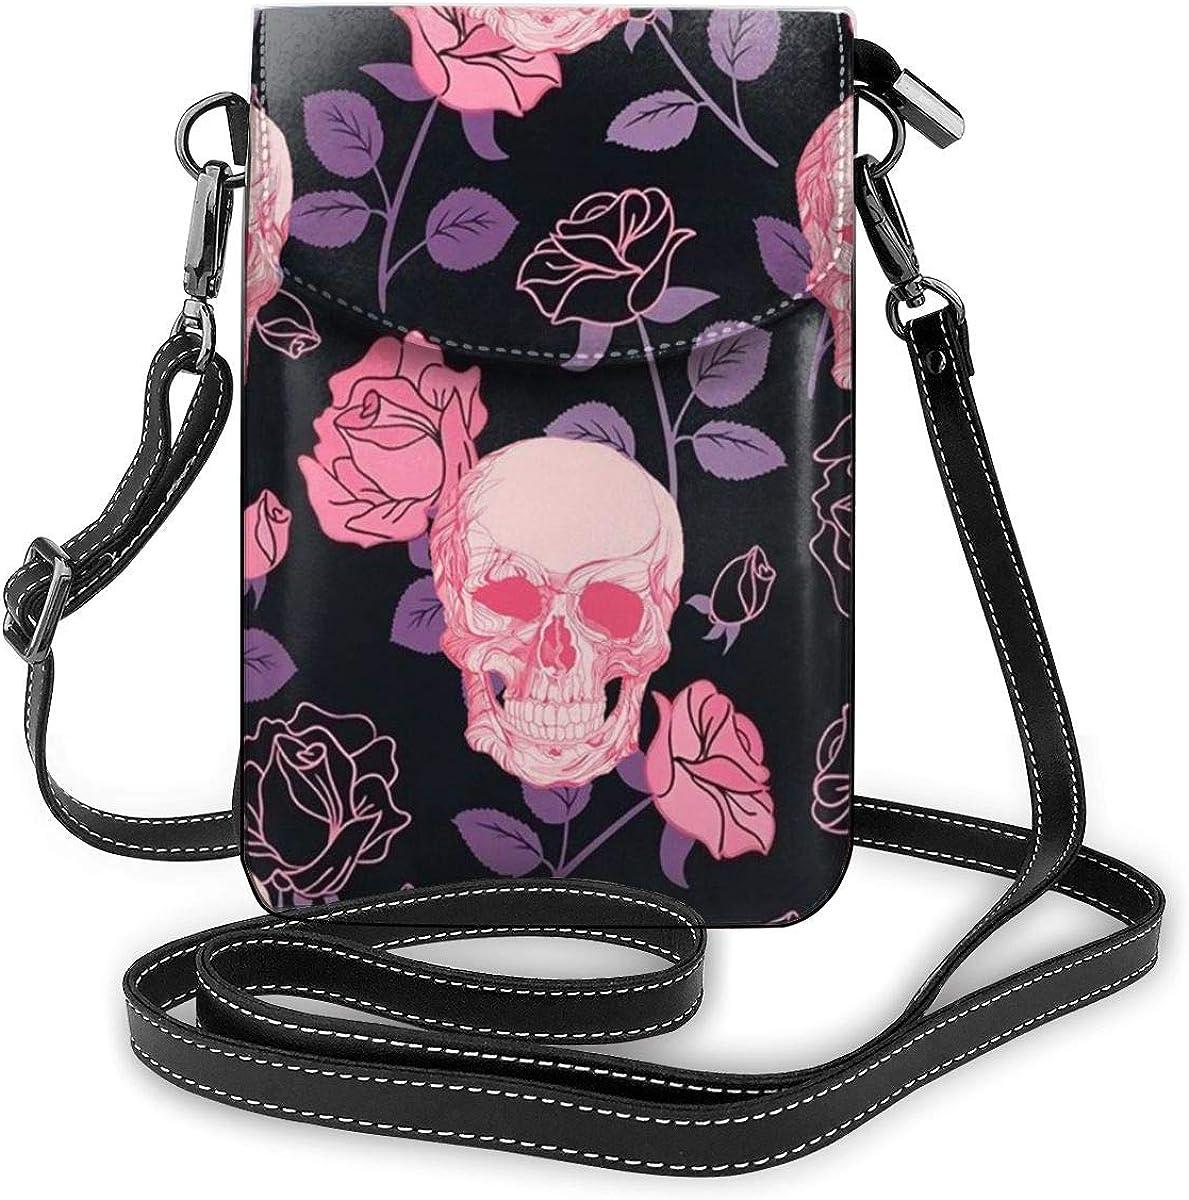 Cell Phone Wallet Pink Sugar Skulls Small Crossbody Cell Phone Purse